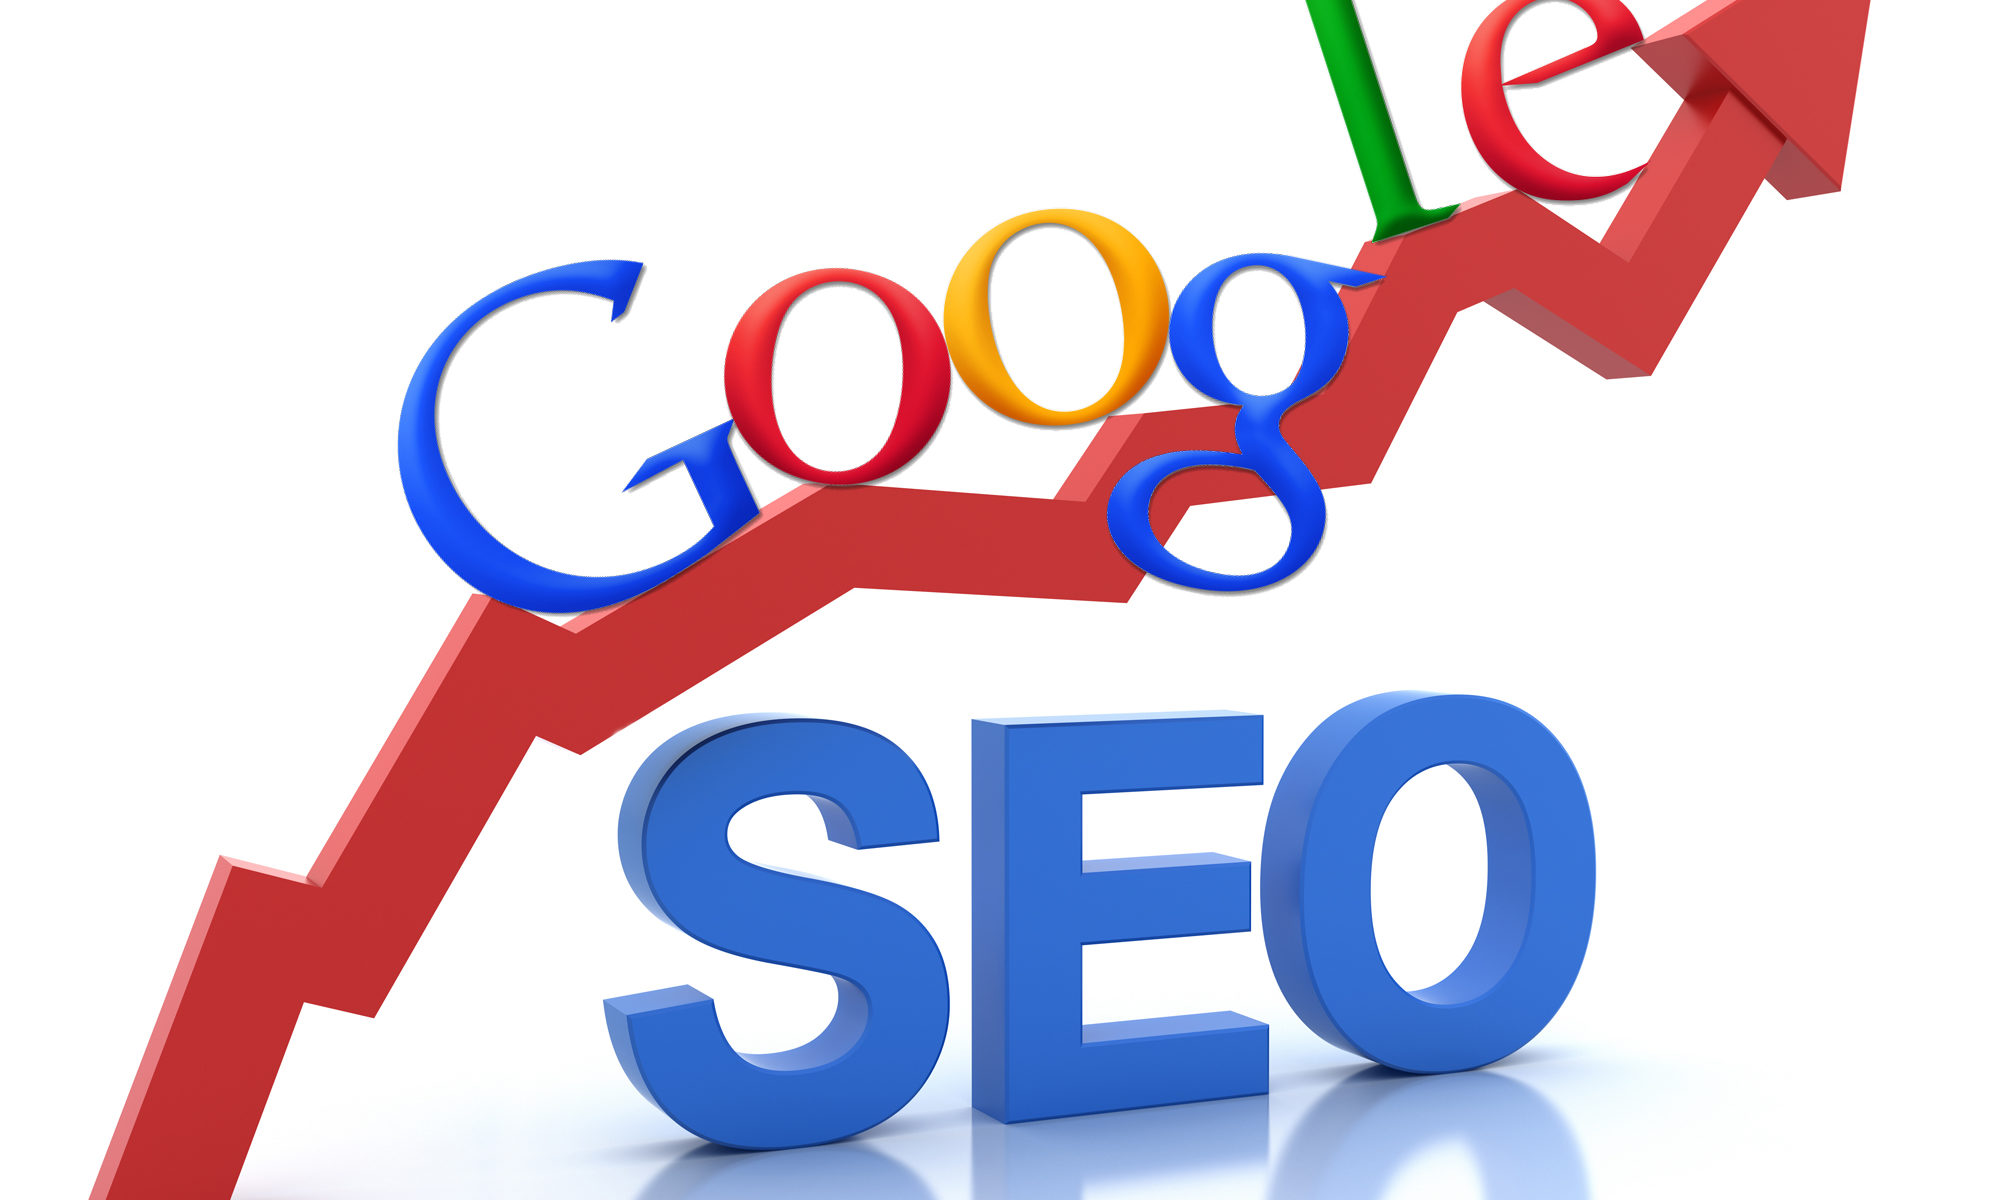 6 Tips to Find The Best Digital Marketing Agency in Kolkata